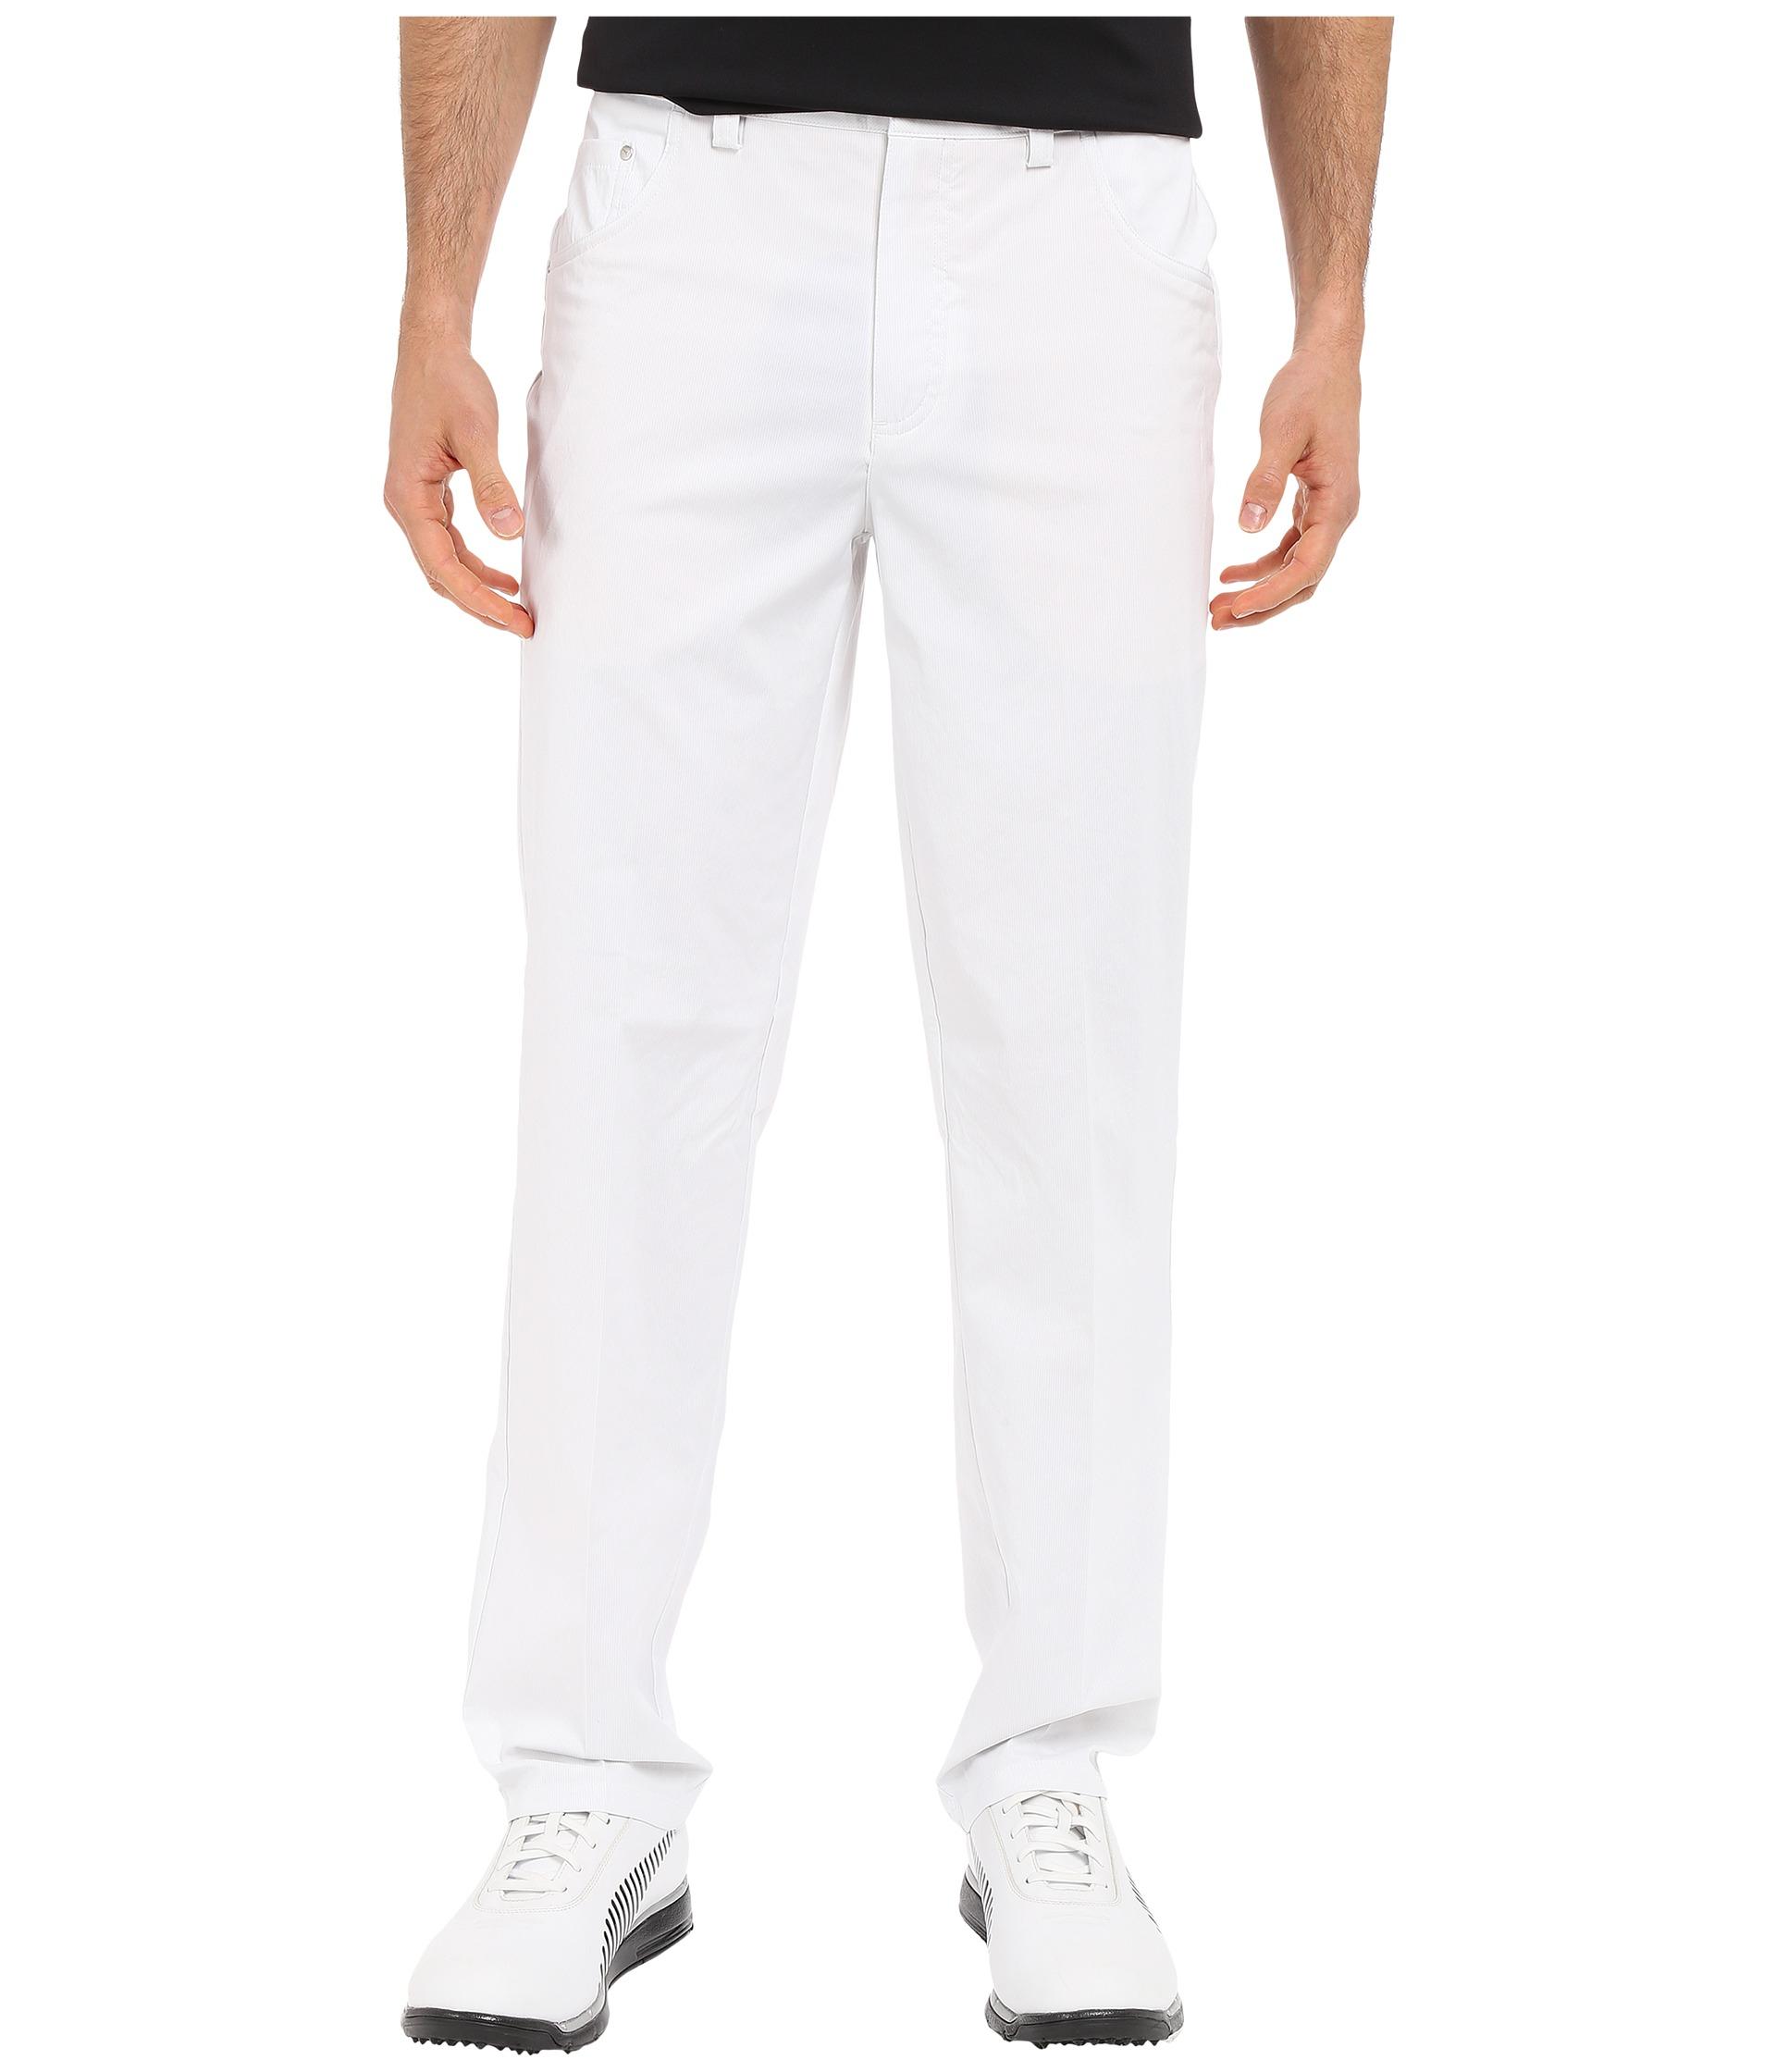 2320f089861b Lyst - PUMA 6-pocket Pants in White for Men